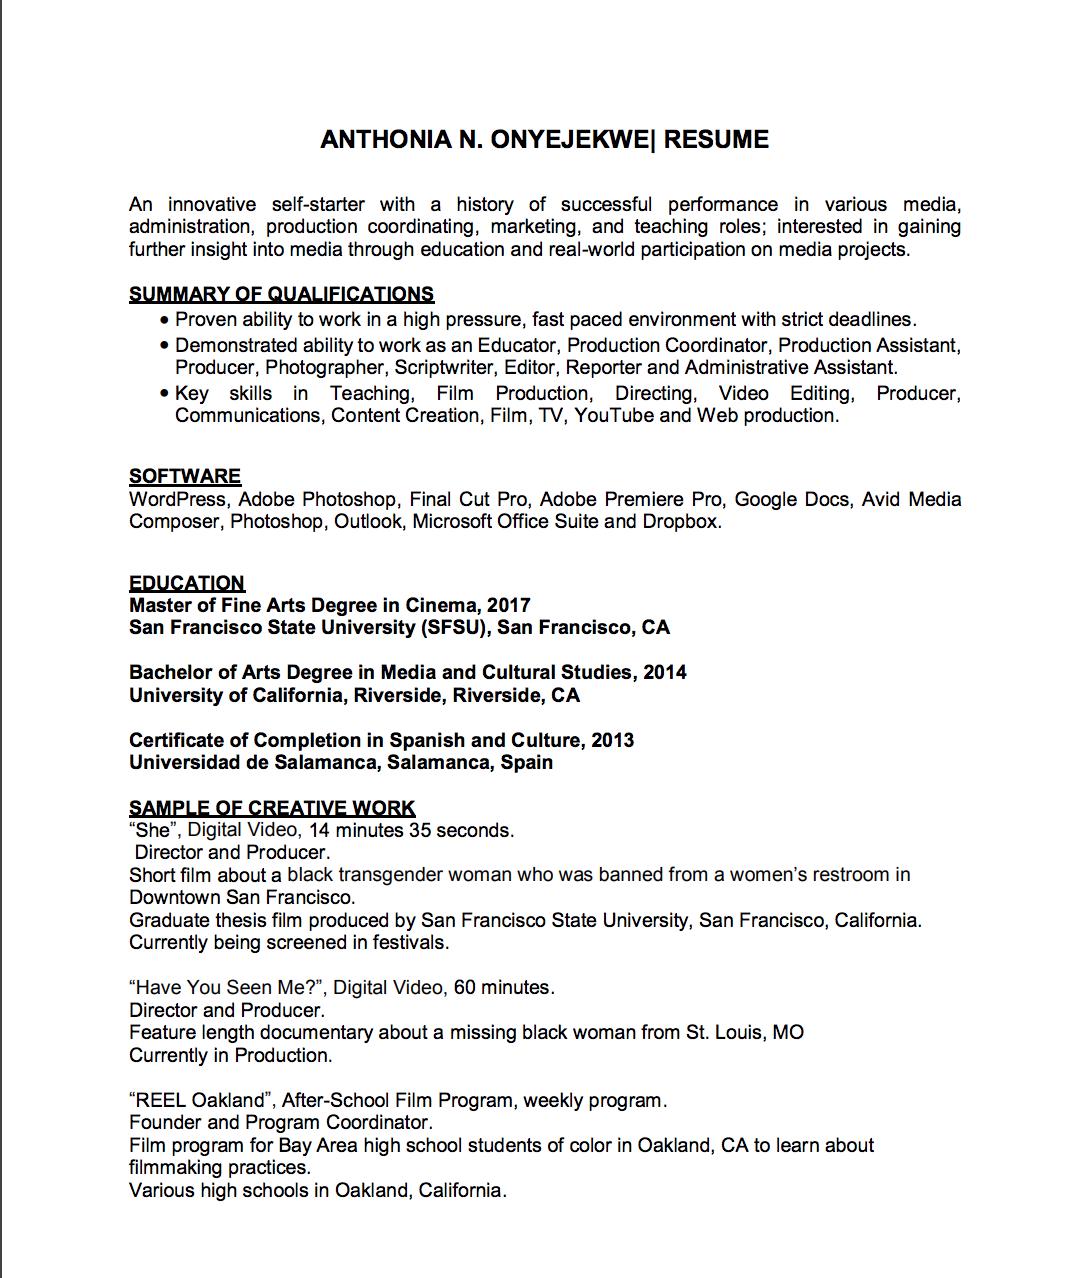 Résumé – anthonia onyejekwe